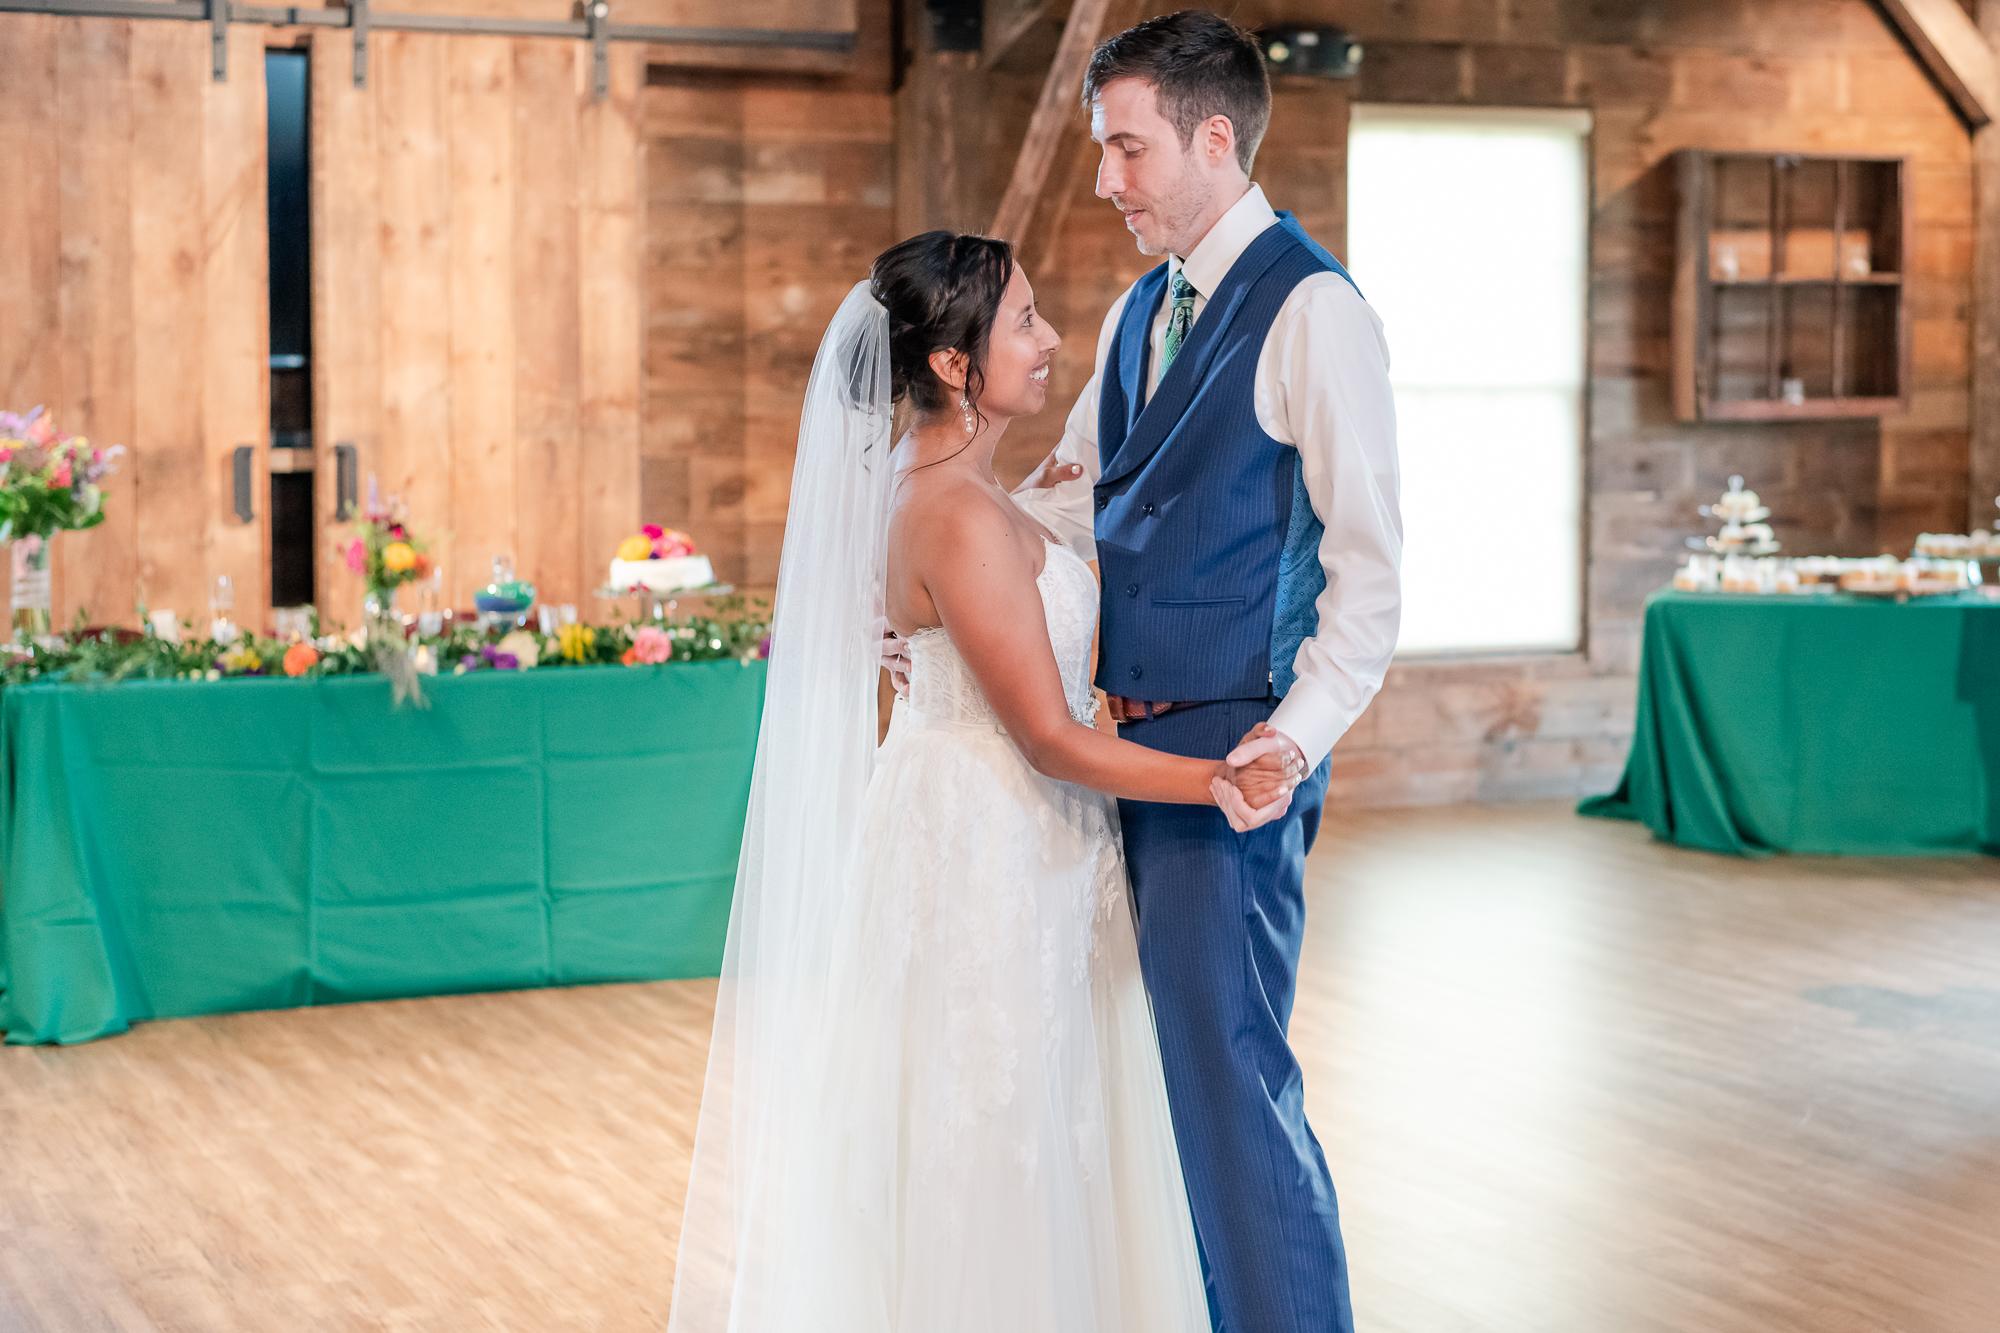 Maria+Adam_Summer Barn Wedding_The Barn at The North Star Preserve_Oberlin_Ohio-189.jpg